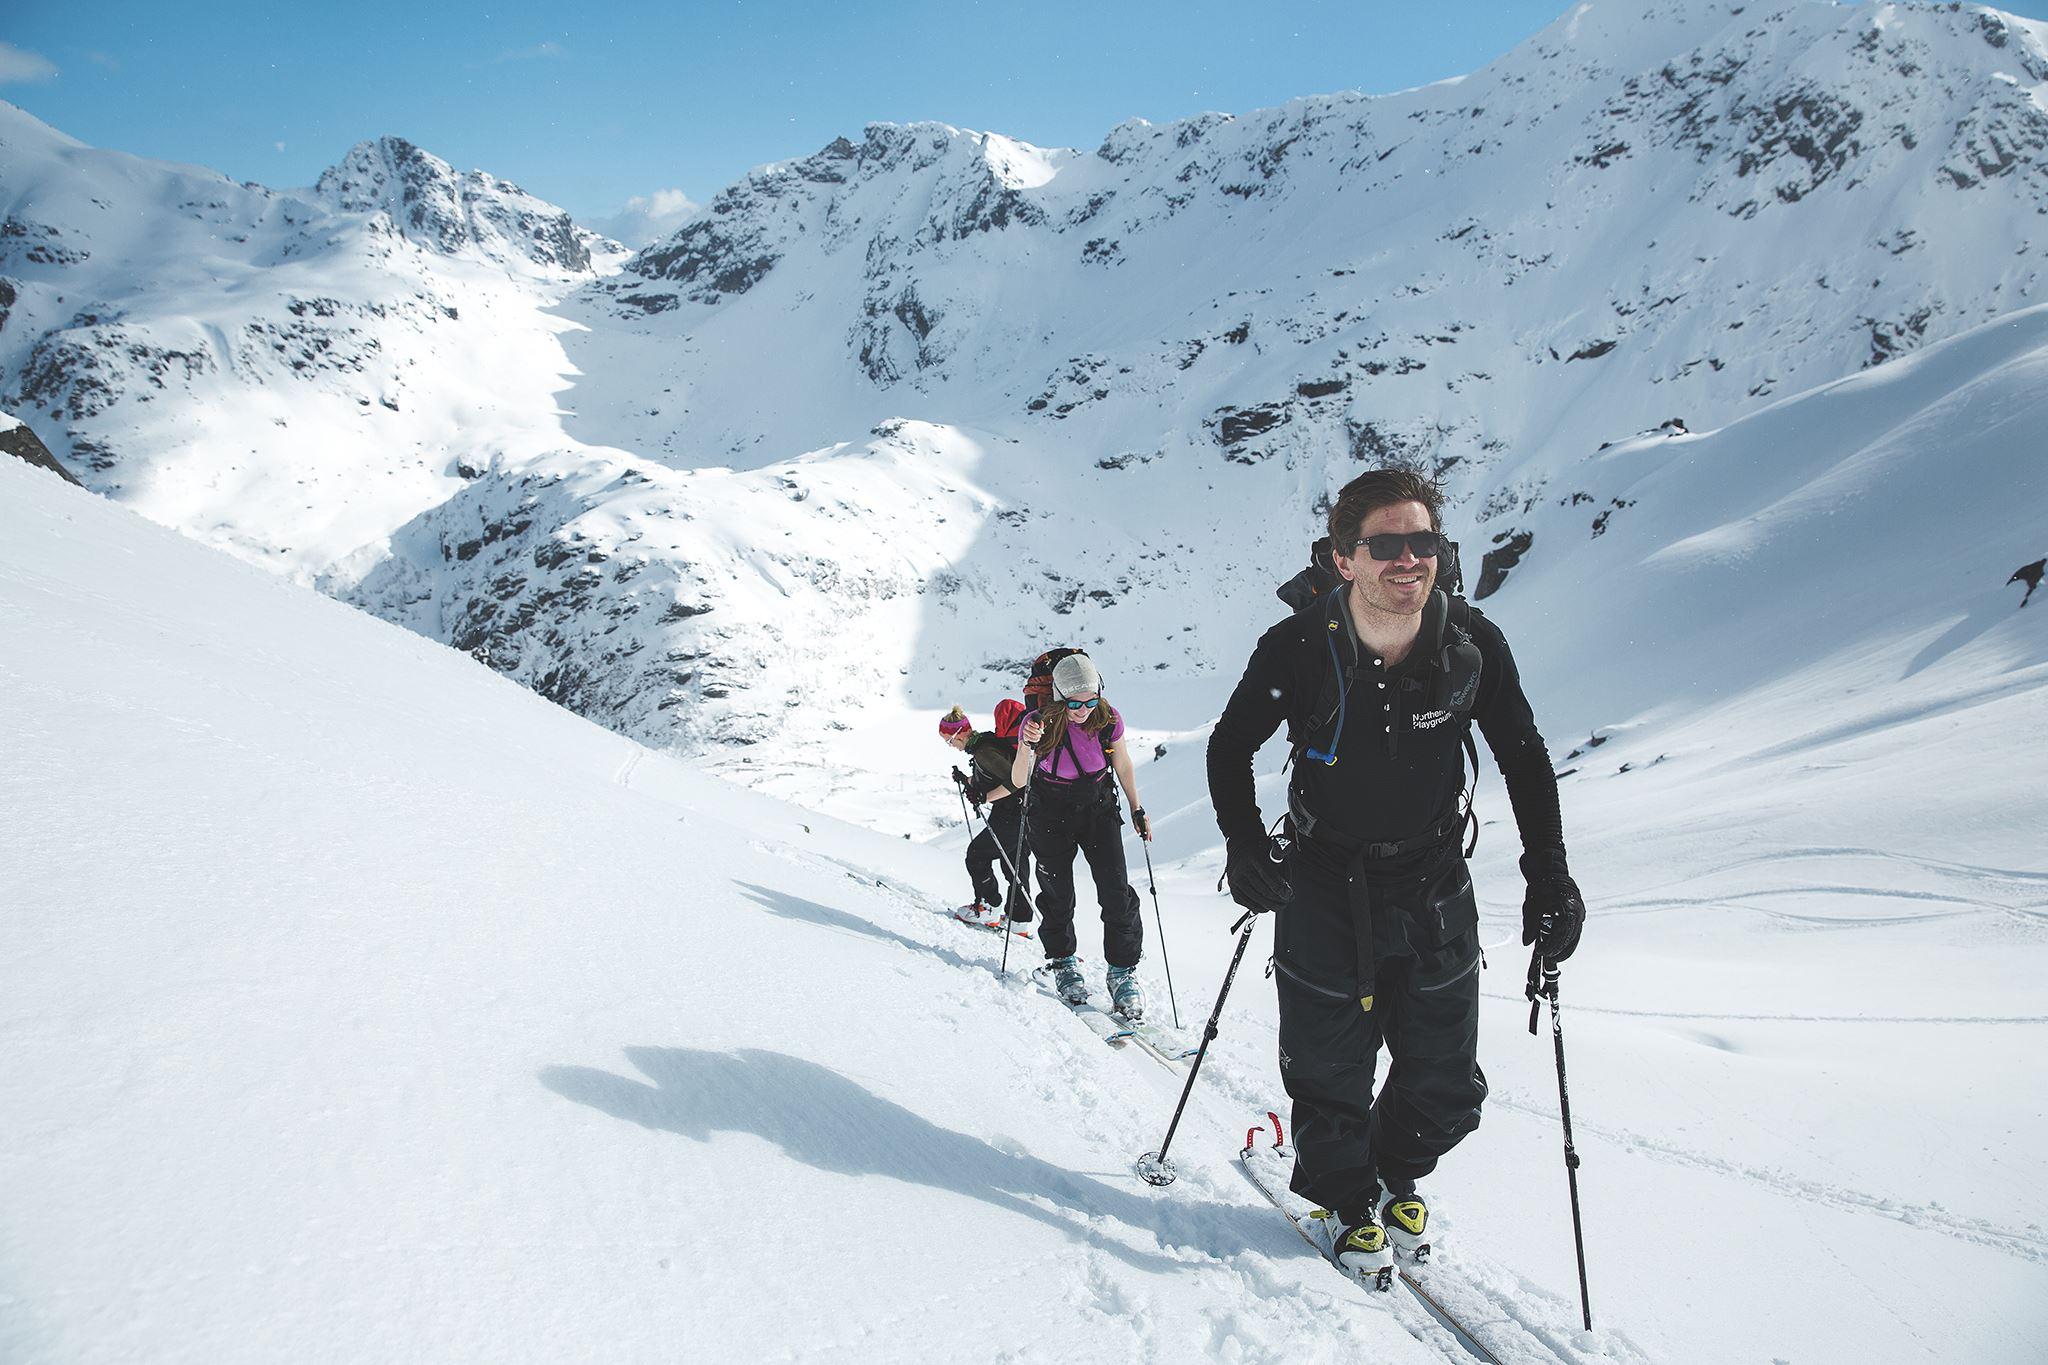 © Seil Norge, Ski & Seil Lofoten